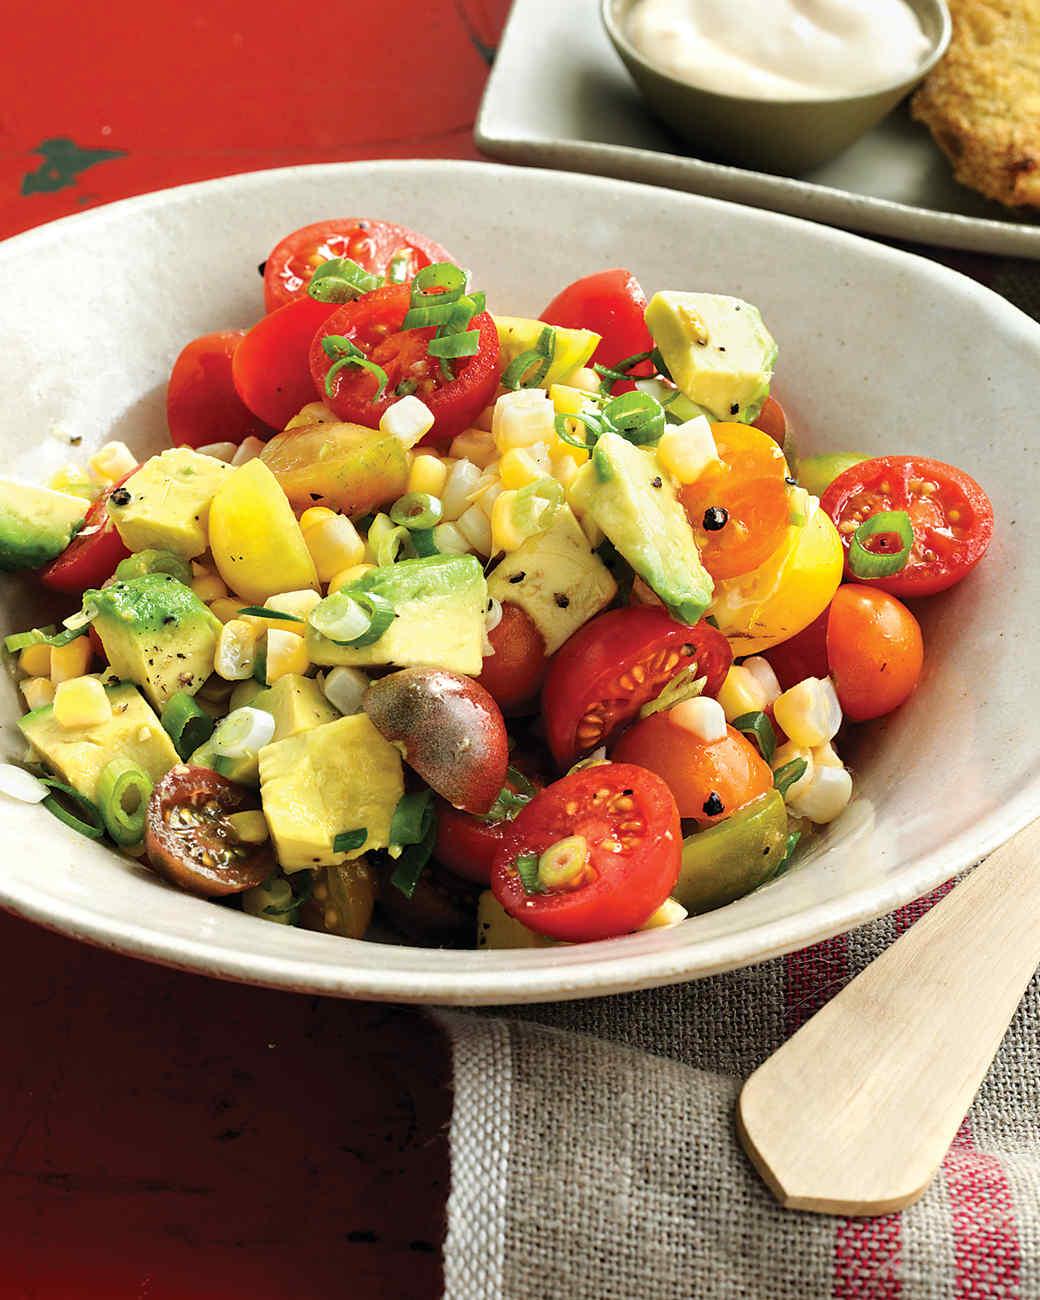 Tomato, Corn, and Avocado Salad